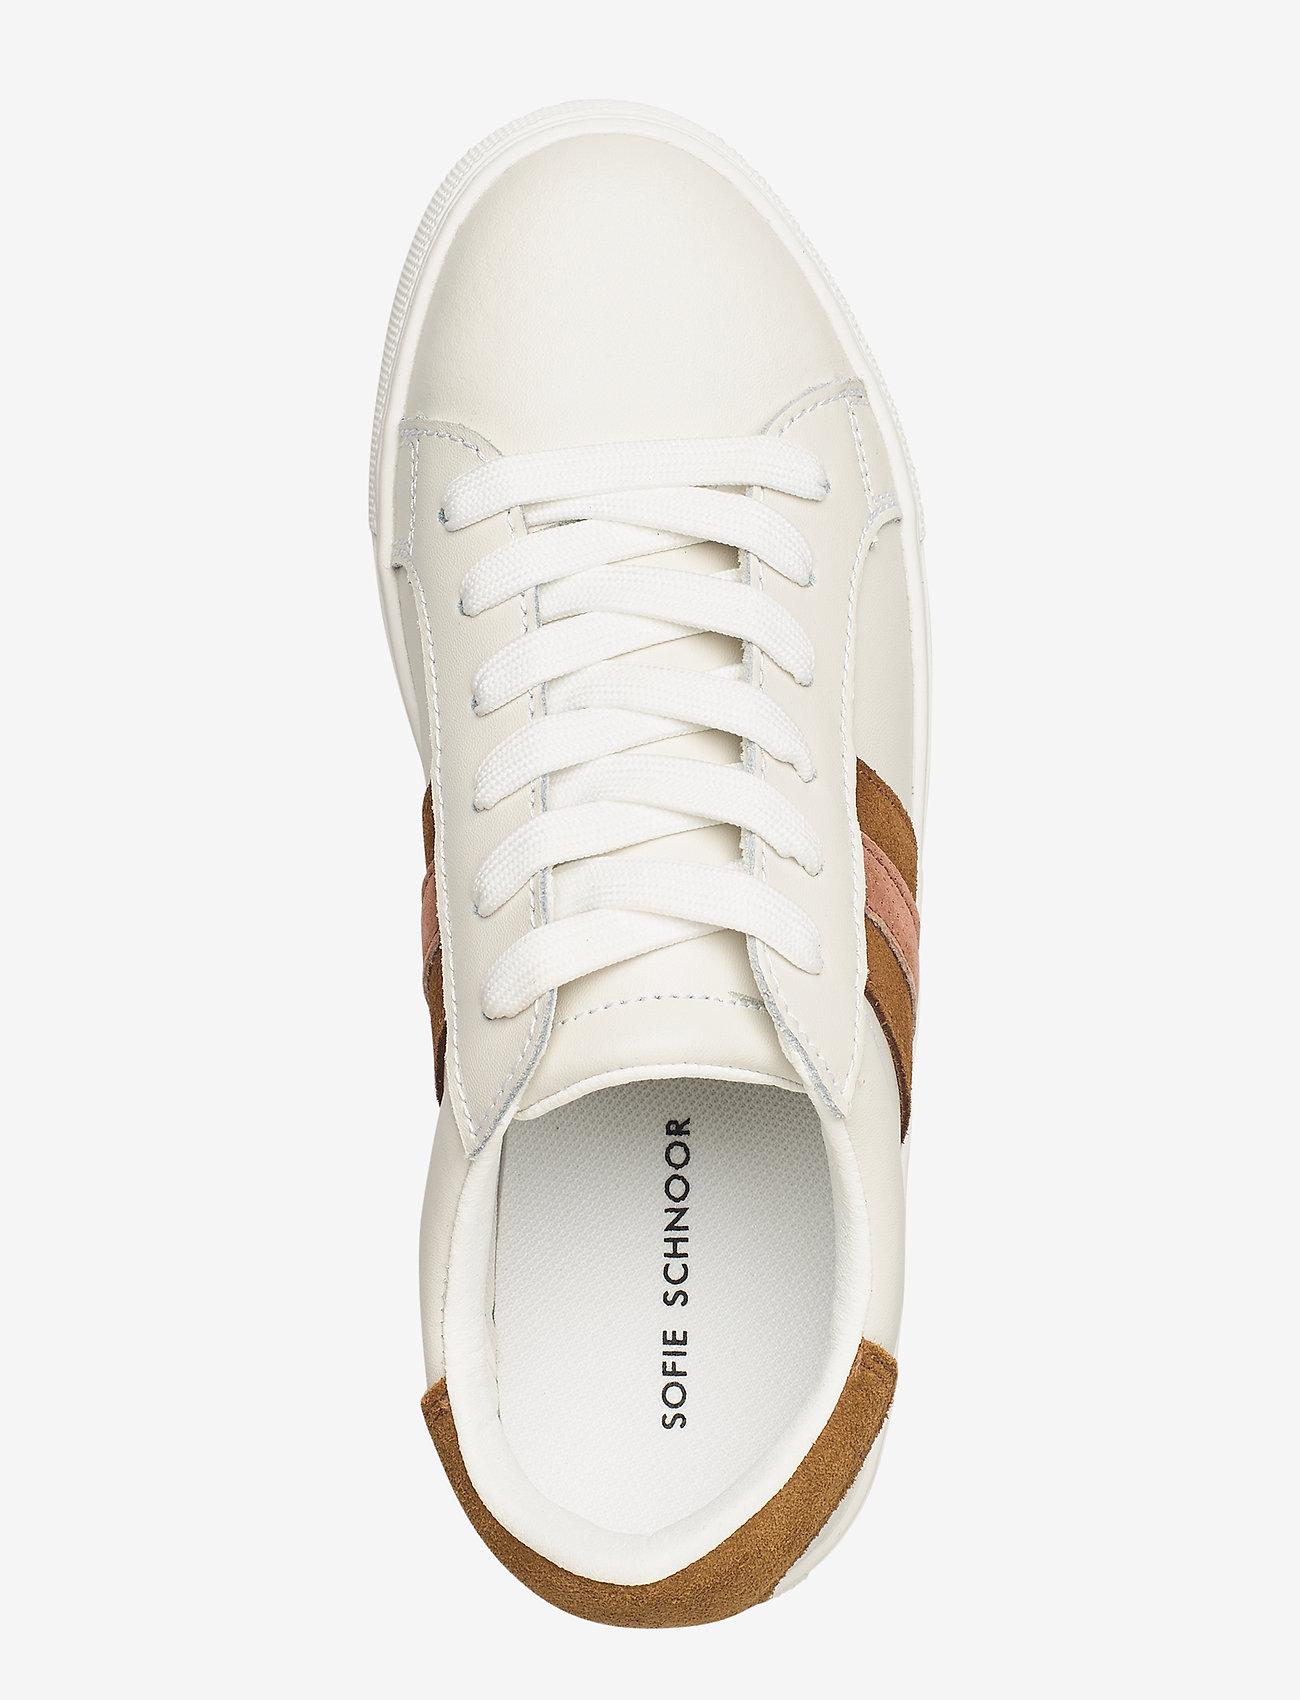 Shoe (White W. Rose) (71.21 €) - Sofie Schnoor hX5Pc